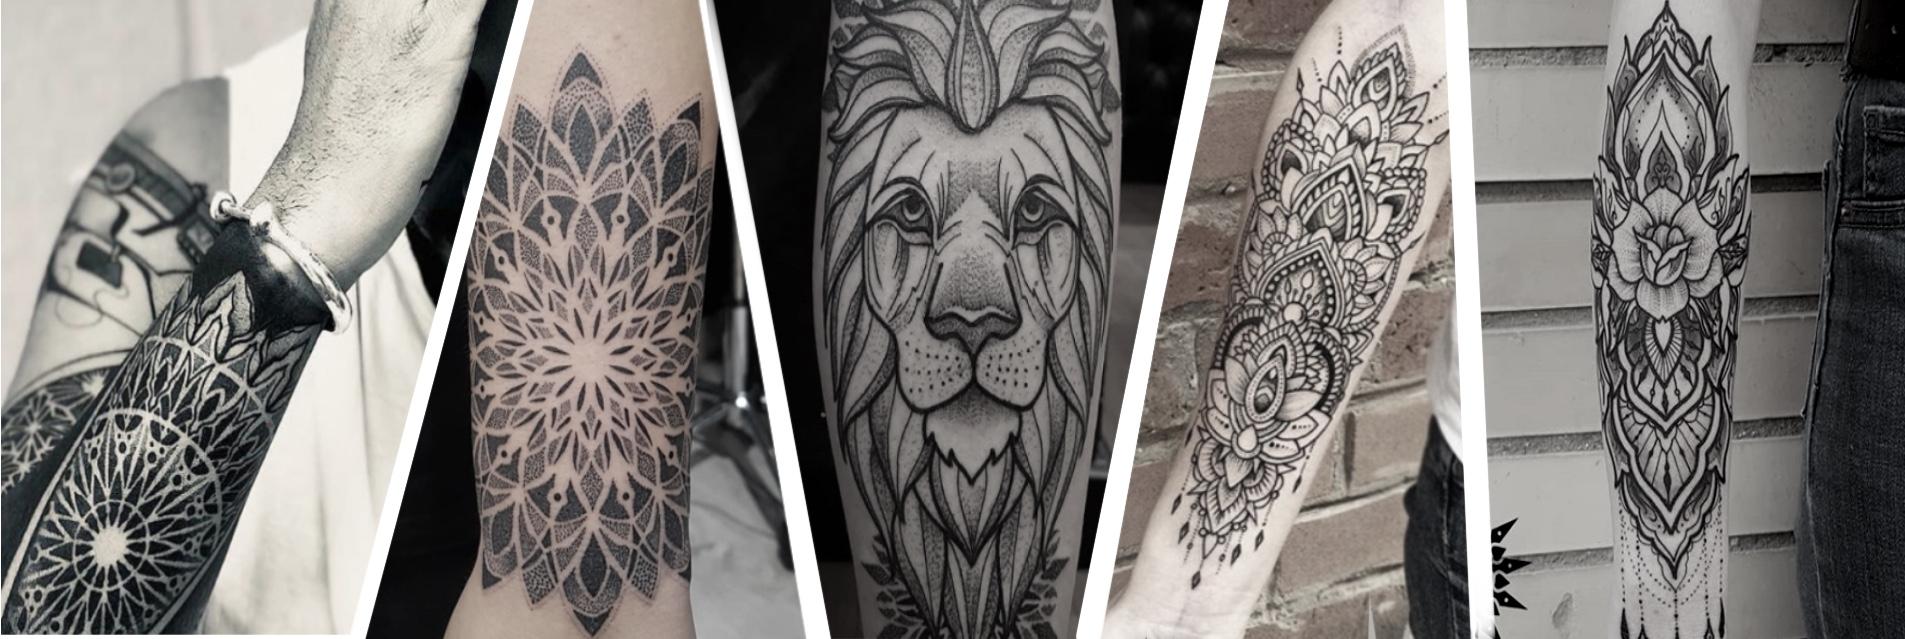 Tatuajes geometricos, mandalas